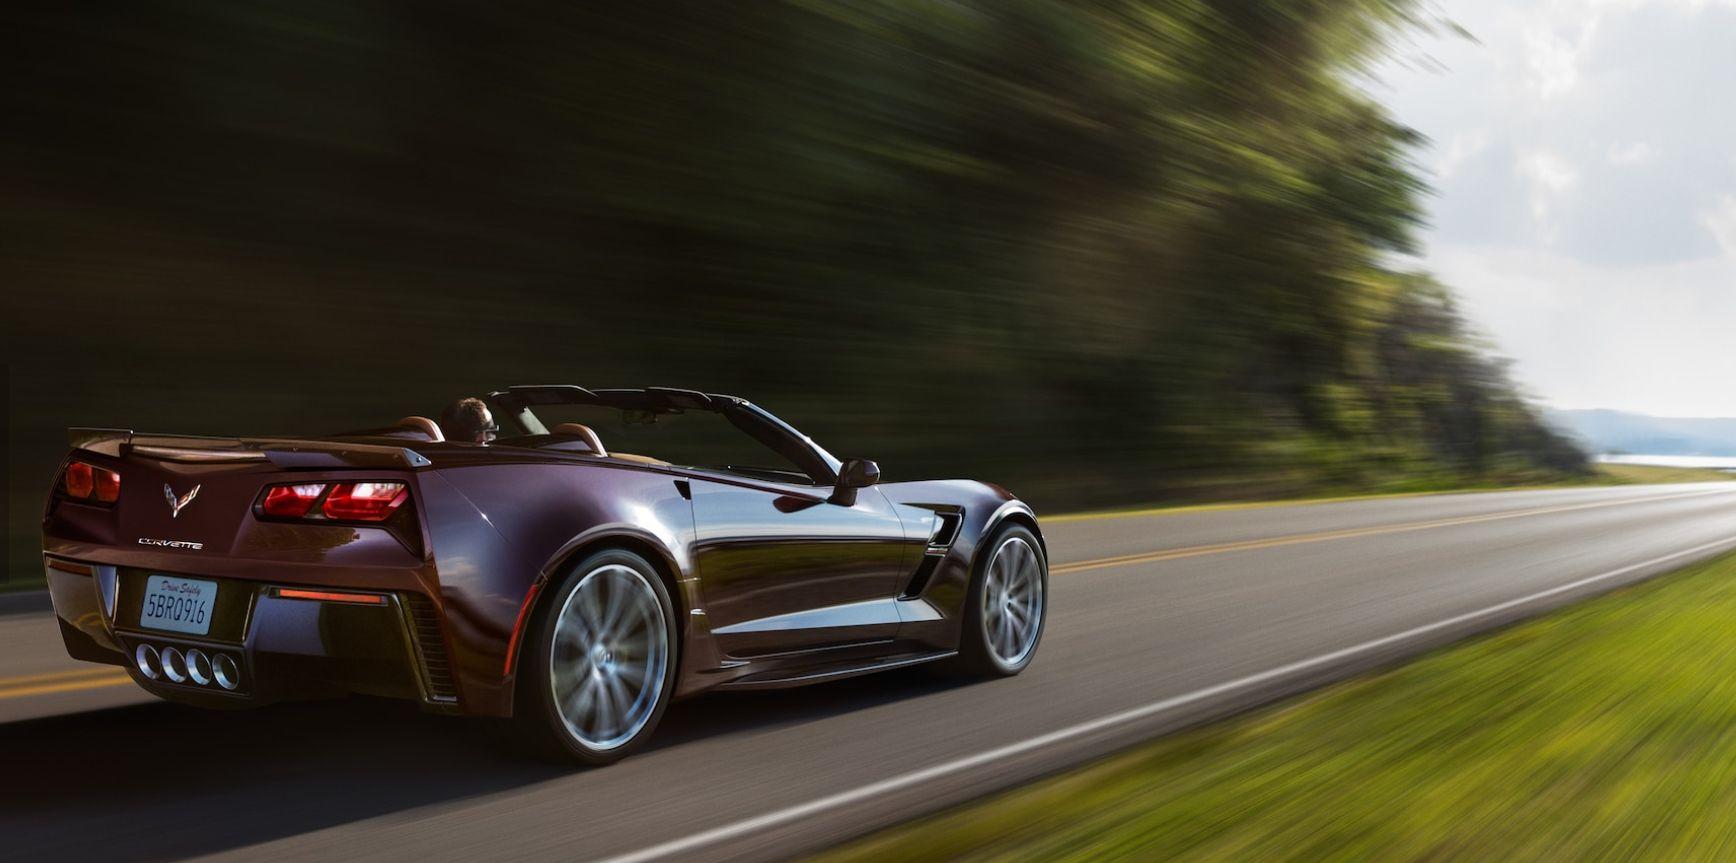 2018 Stingray Corvette grand sport, Sports car, Corvette